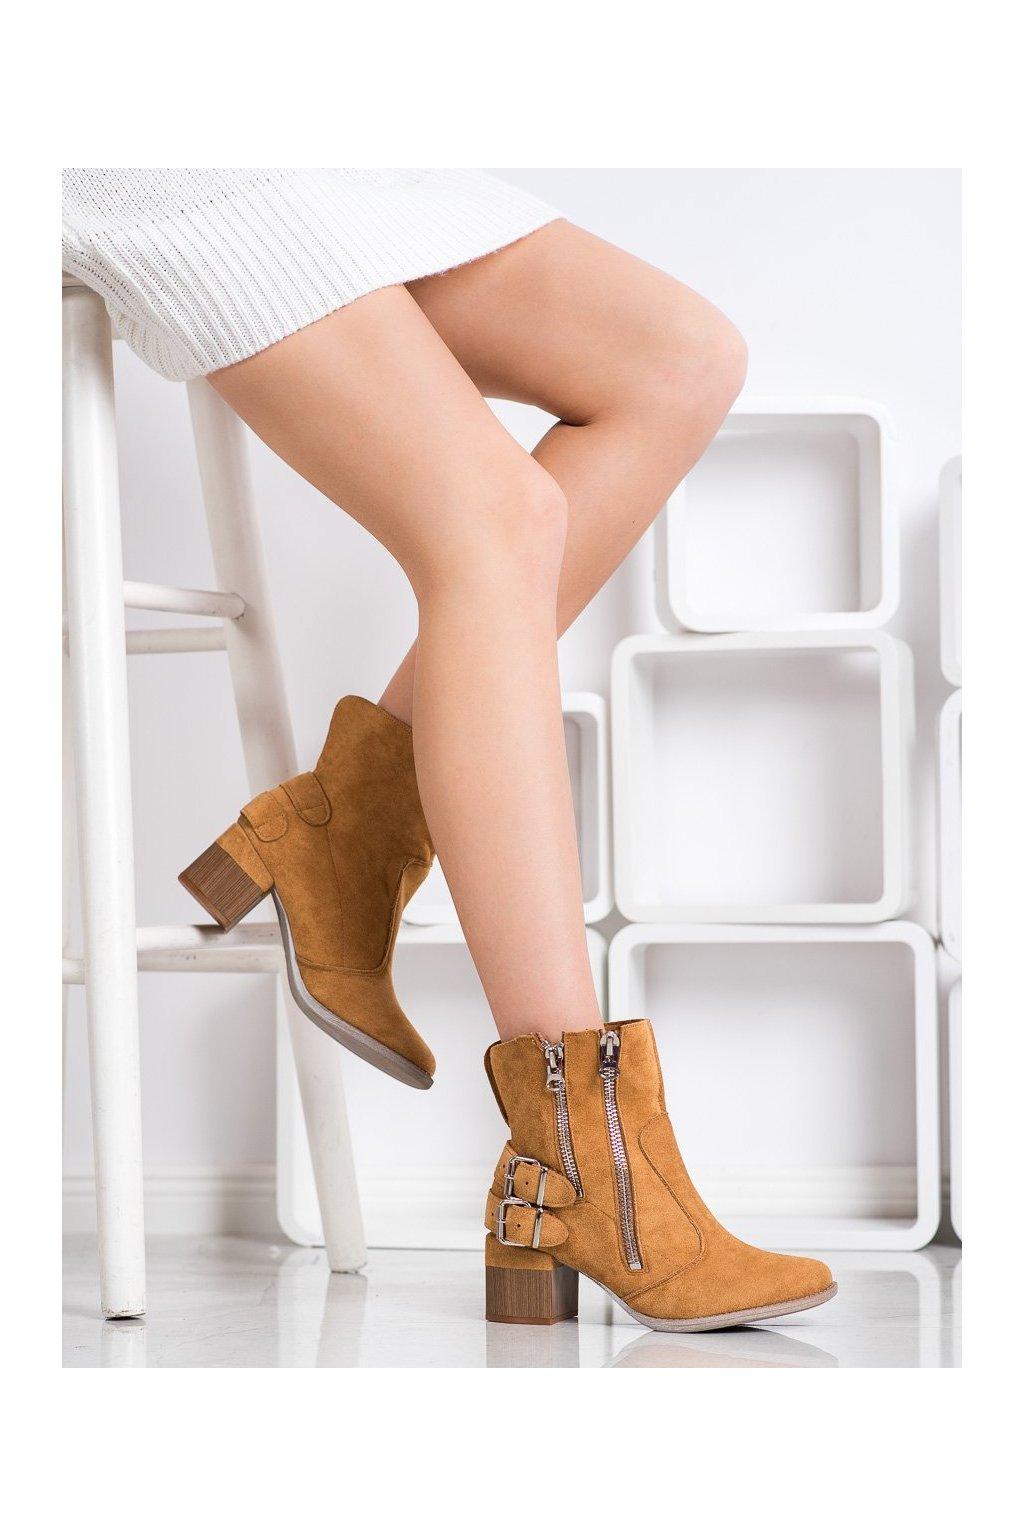 Hnedé dámske topánky Bella paris kod A6110C